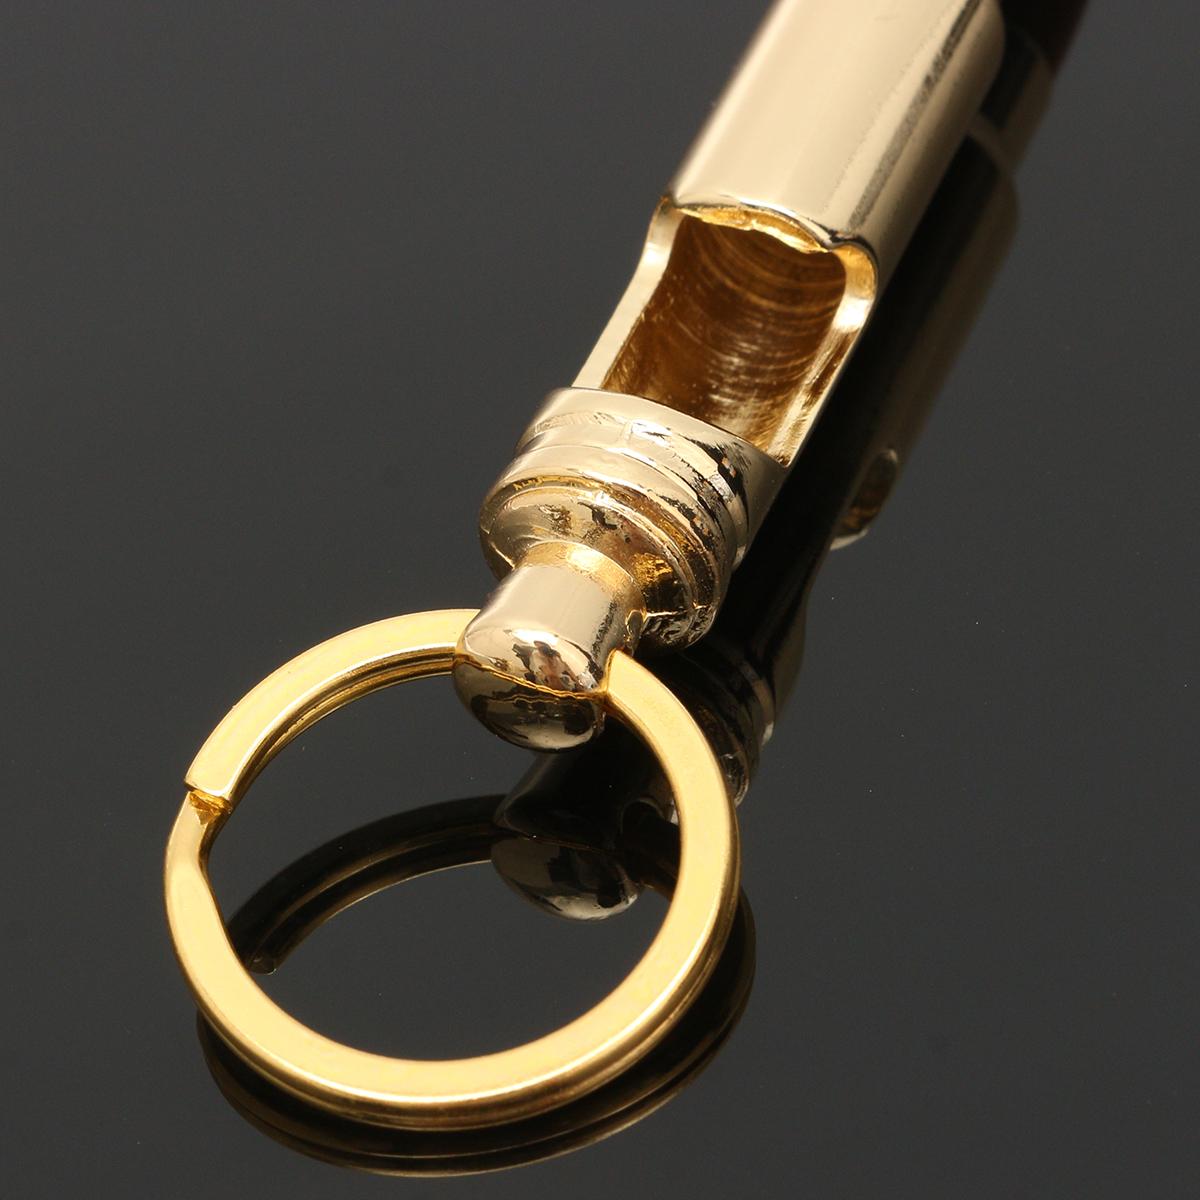 Bullet Shell Shape Bottle Opener Beer Soda Gold Keychain Key Ring Bar Tool Gifts